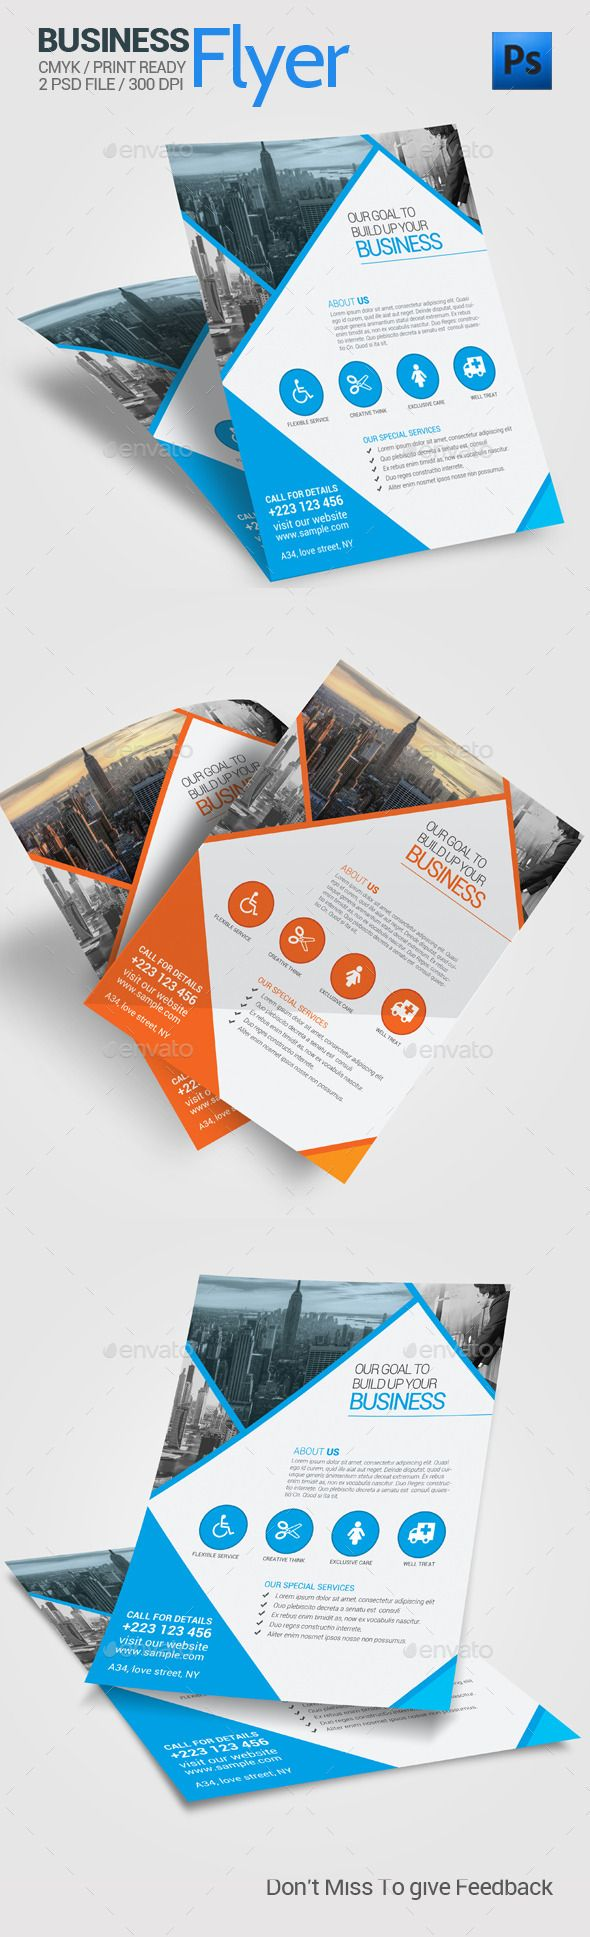 For Jon McDonald Deluxe Cabin RentalsCorporate Business Flyer